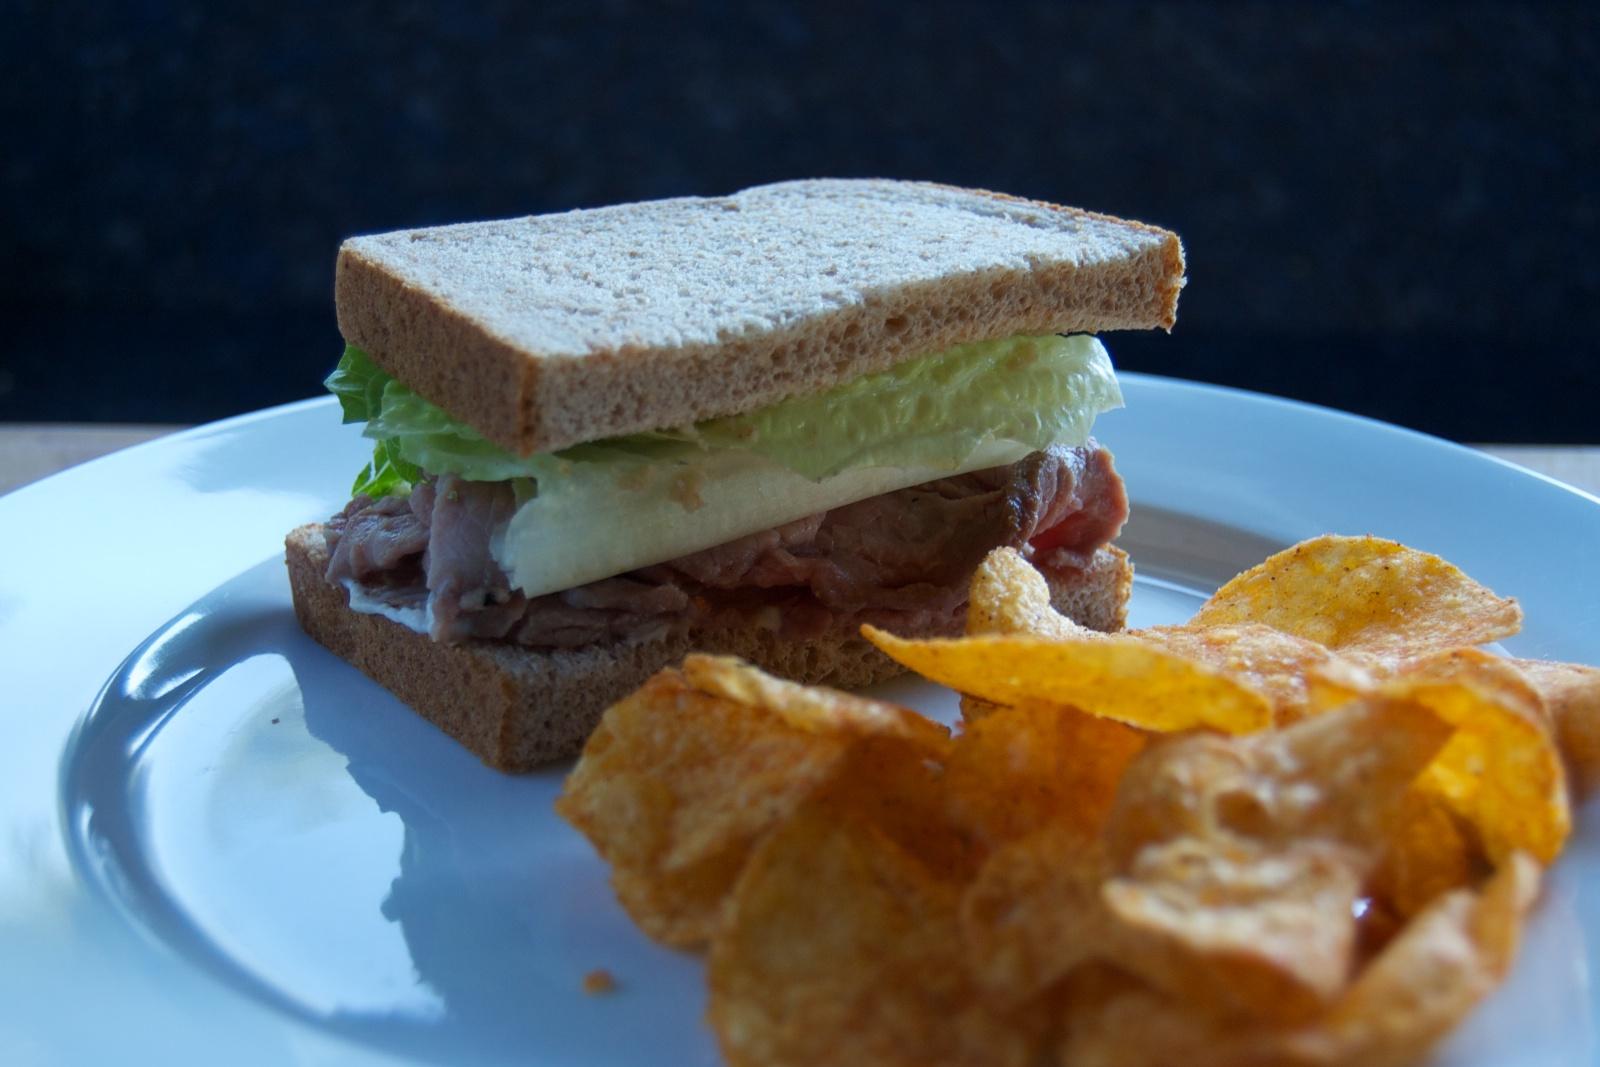 http://blog.rickk.com/food/2011/09/13/ate.2011.09.13.l.jpg